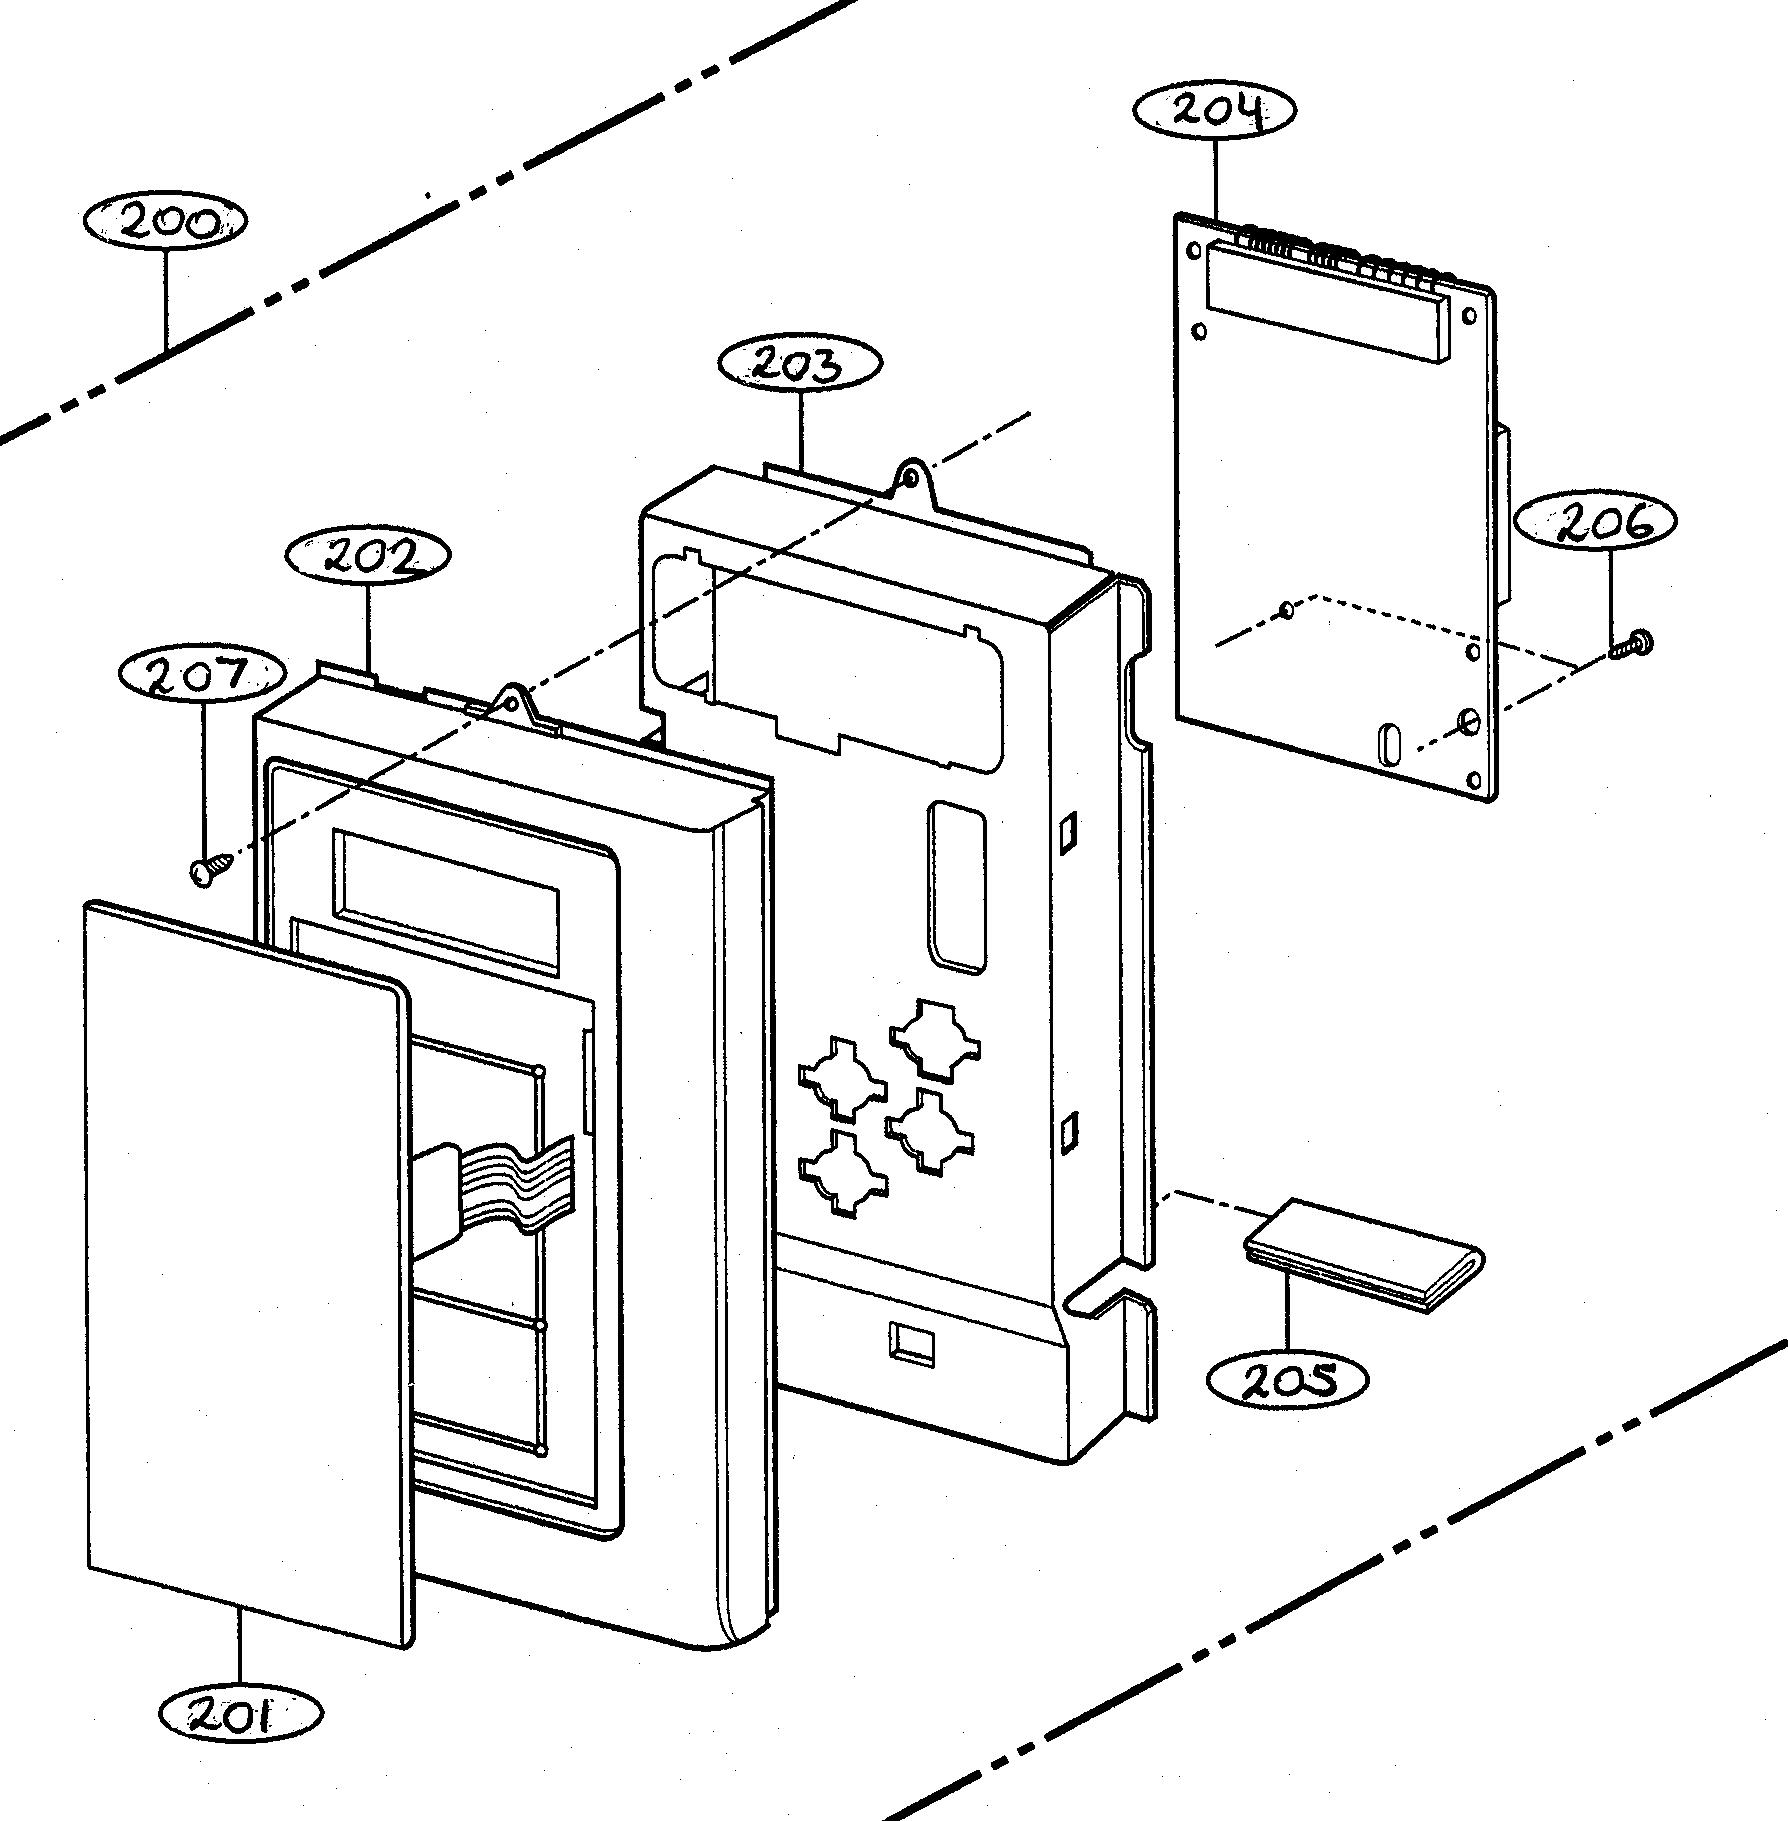 Goldstar Microwave Mv1526w Wiring Diagram Electrical Diagrams Coffee Maker Model Mv 1526w Hood Combo Genuine Parts Farberware Pot